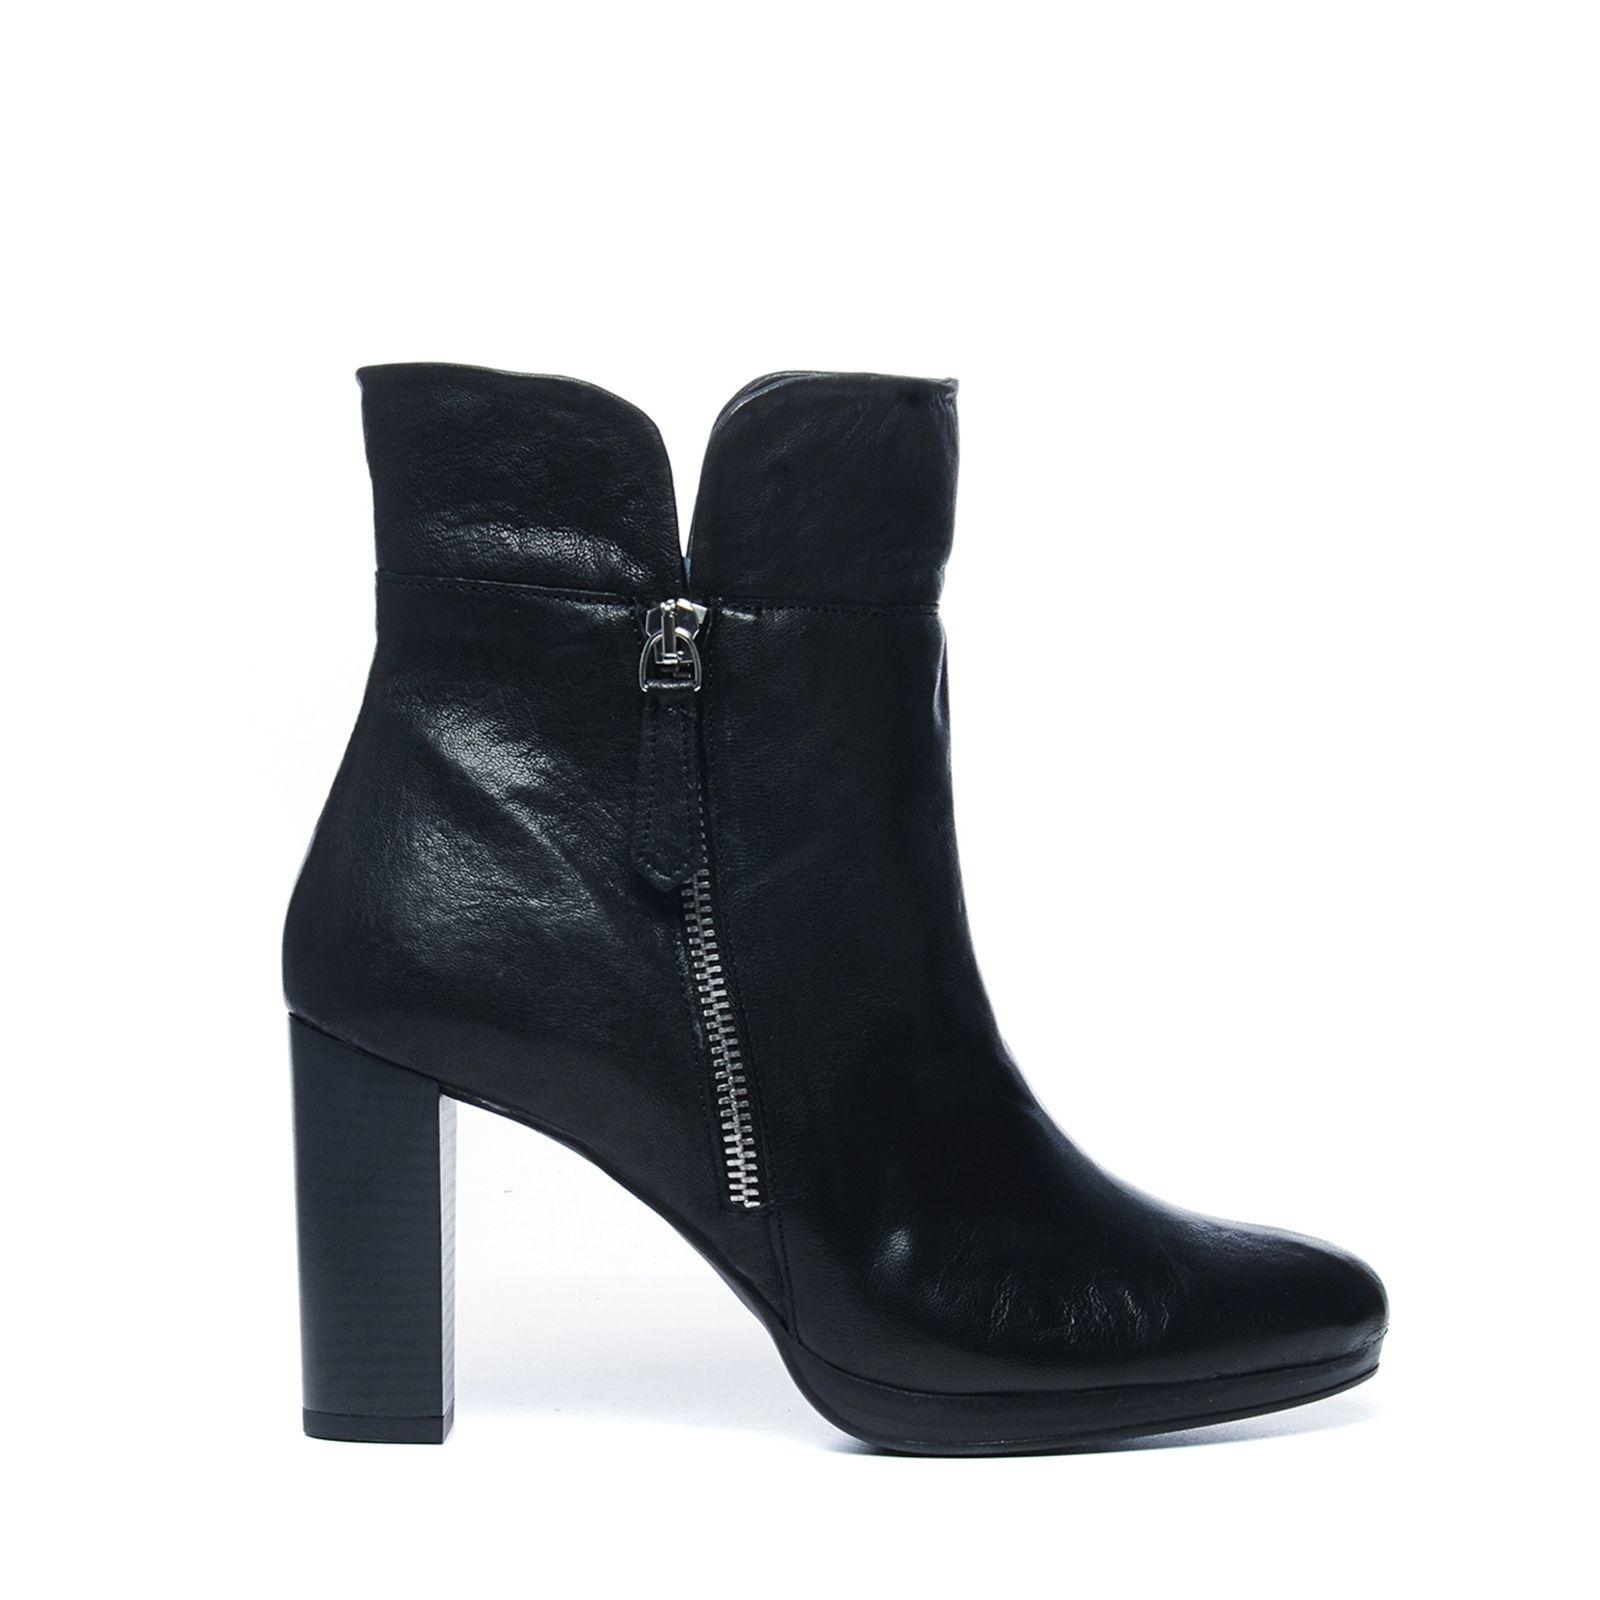 zwarte laarzen hak